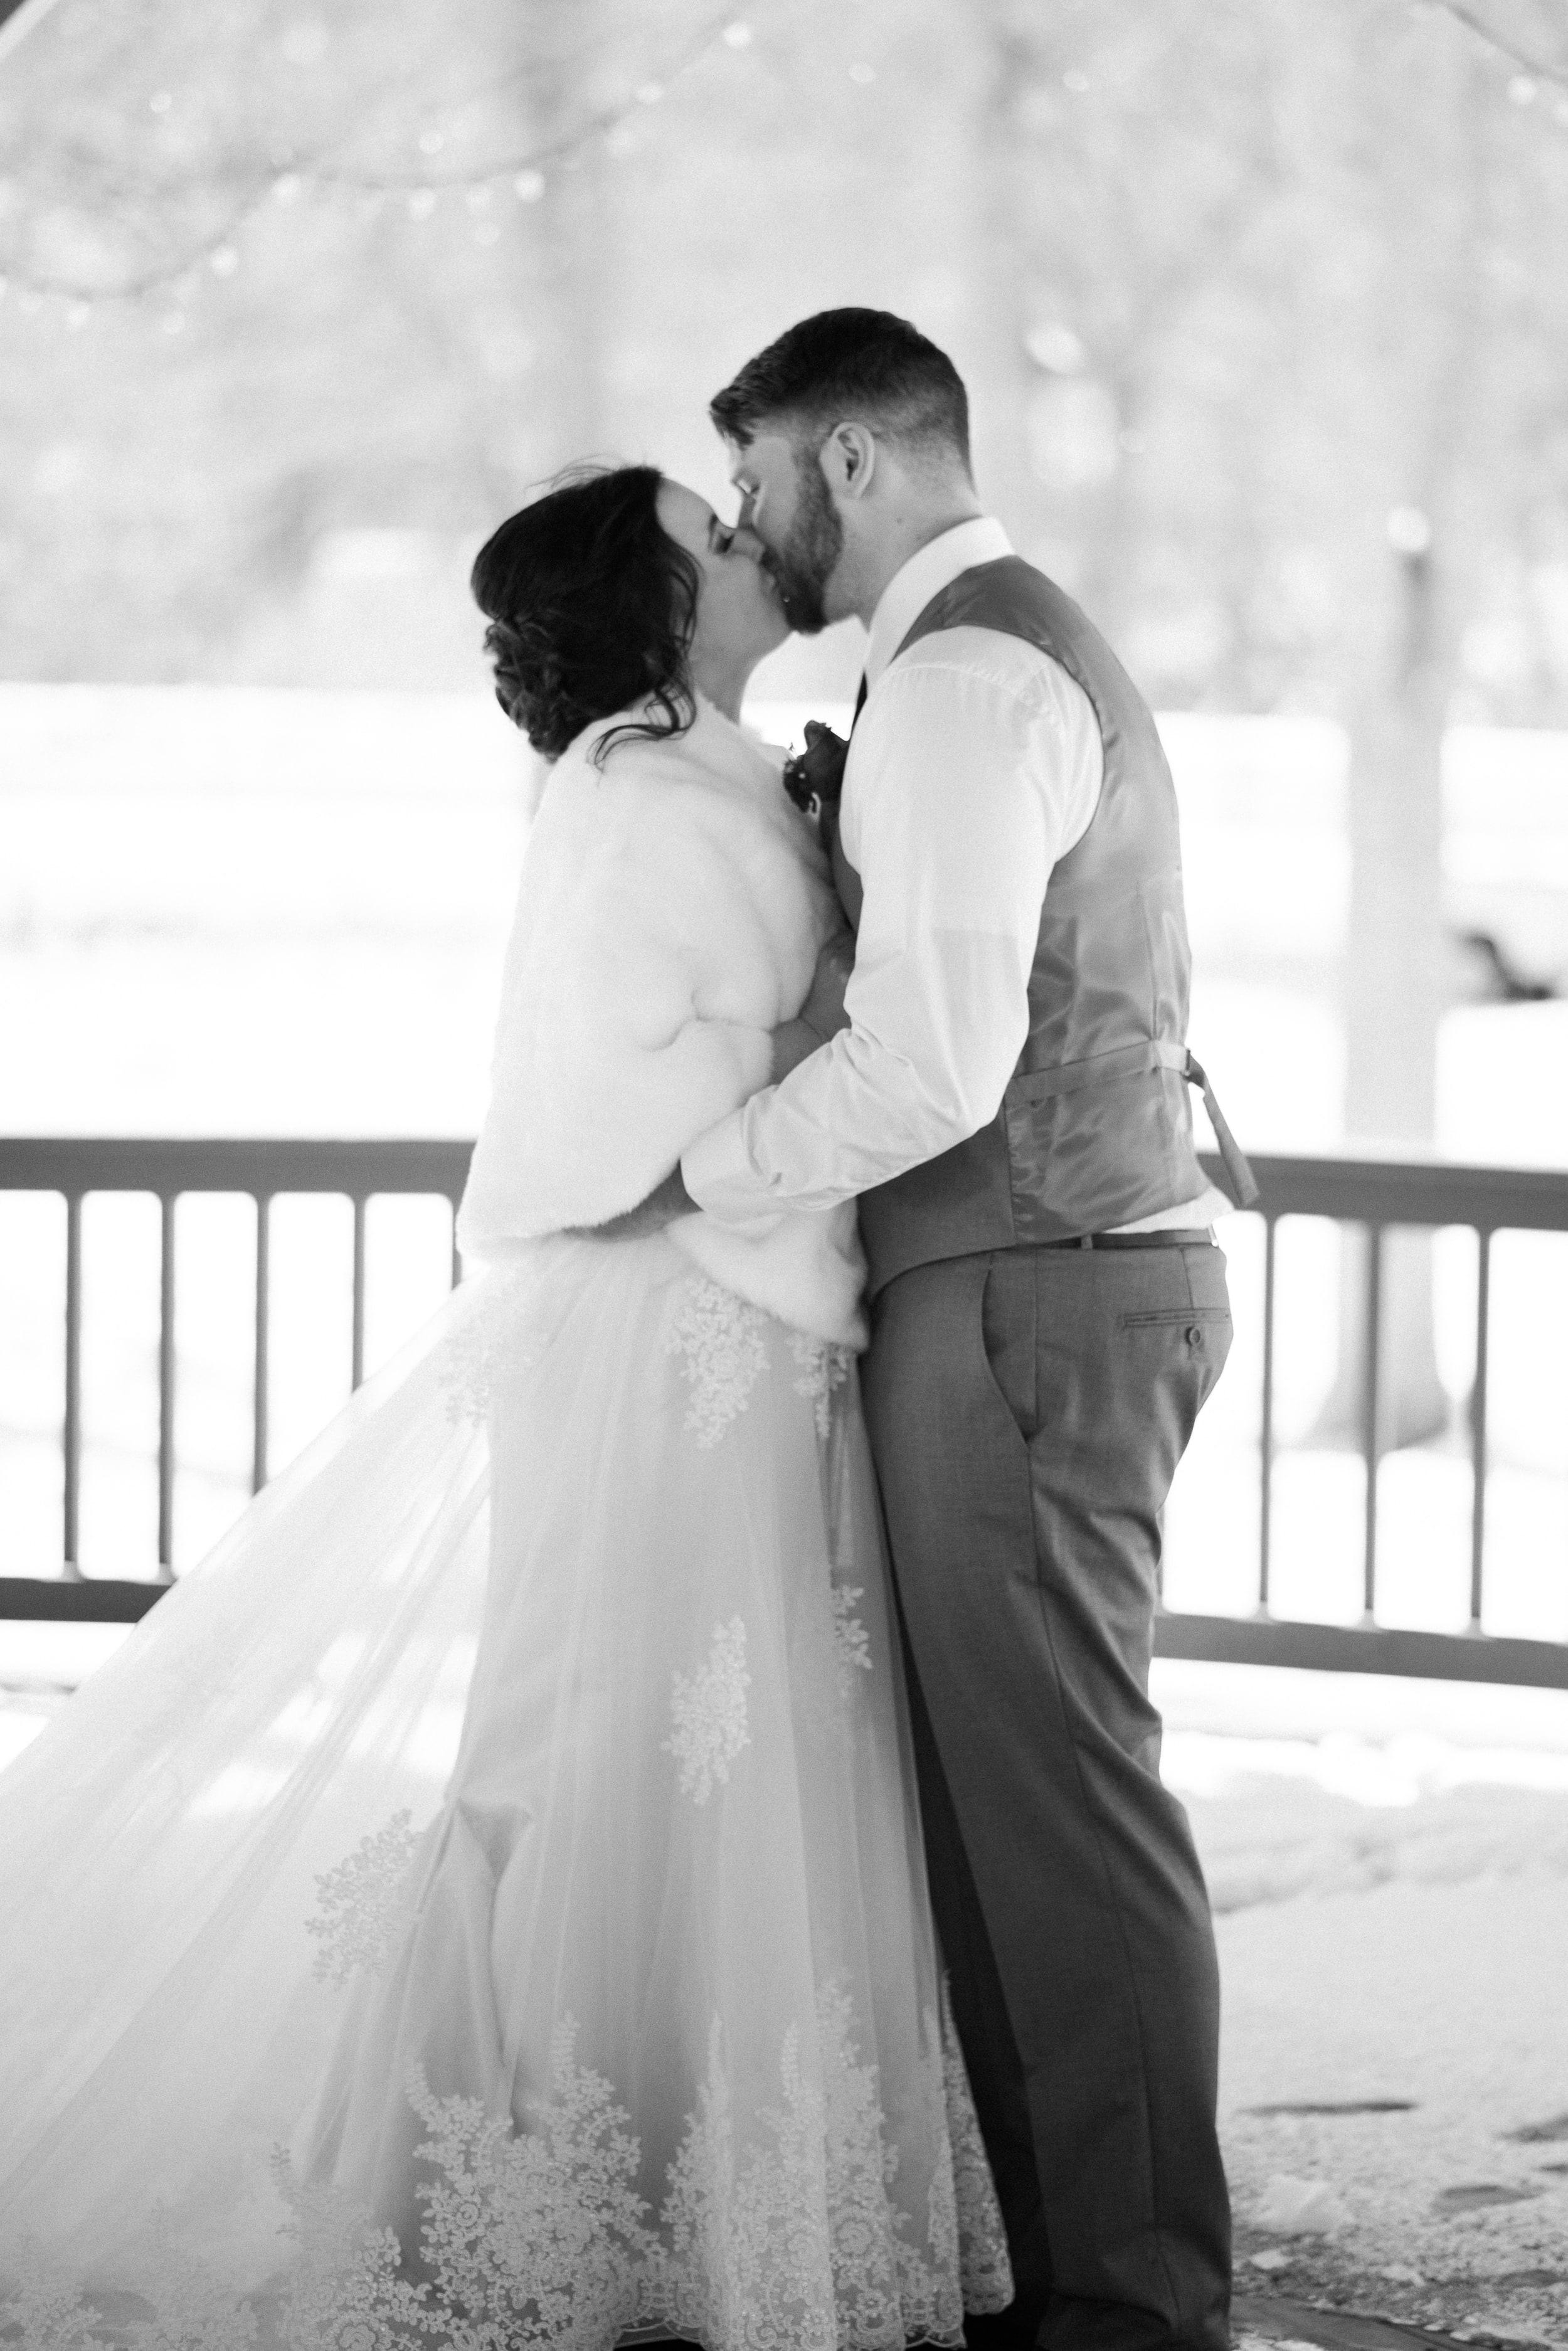 snowy-intimate-wedding-30.jpg